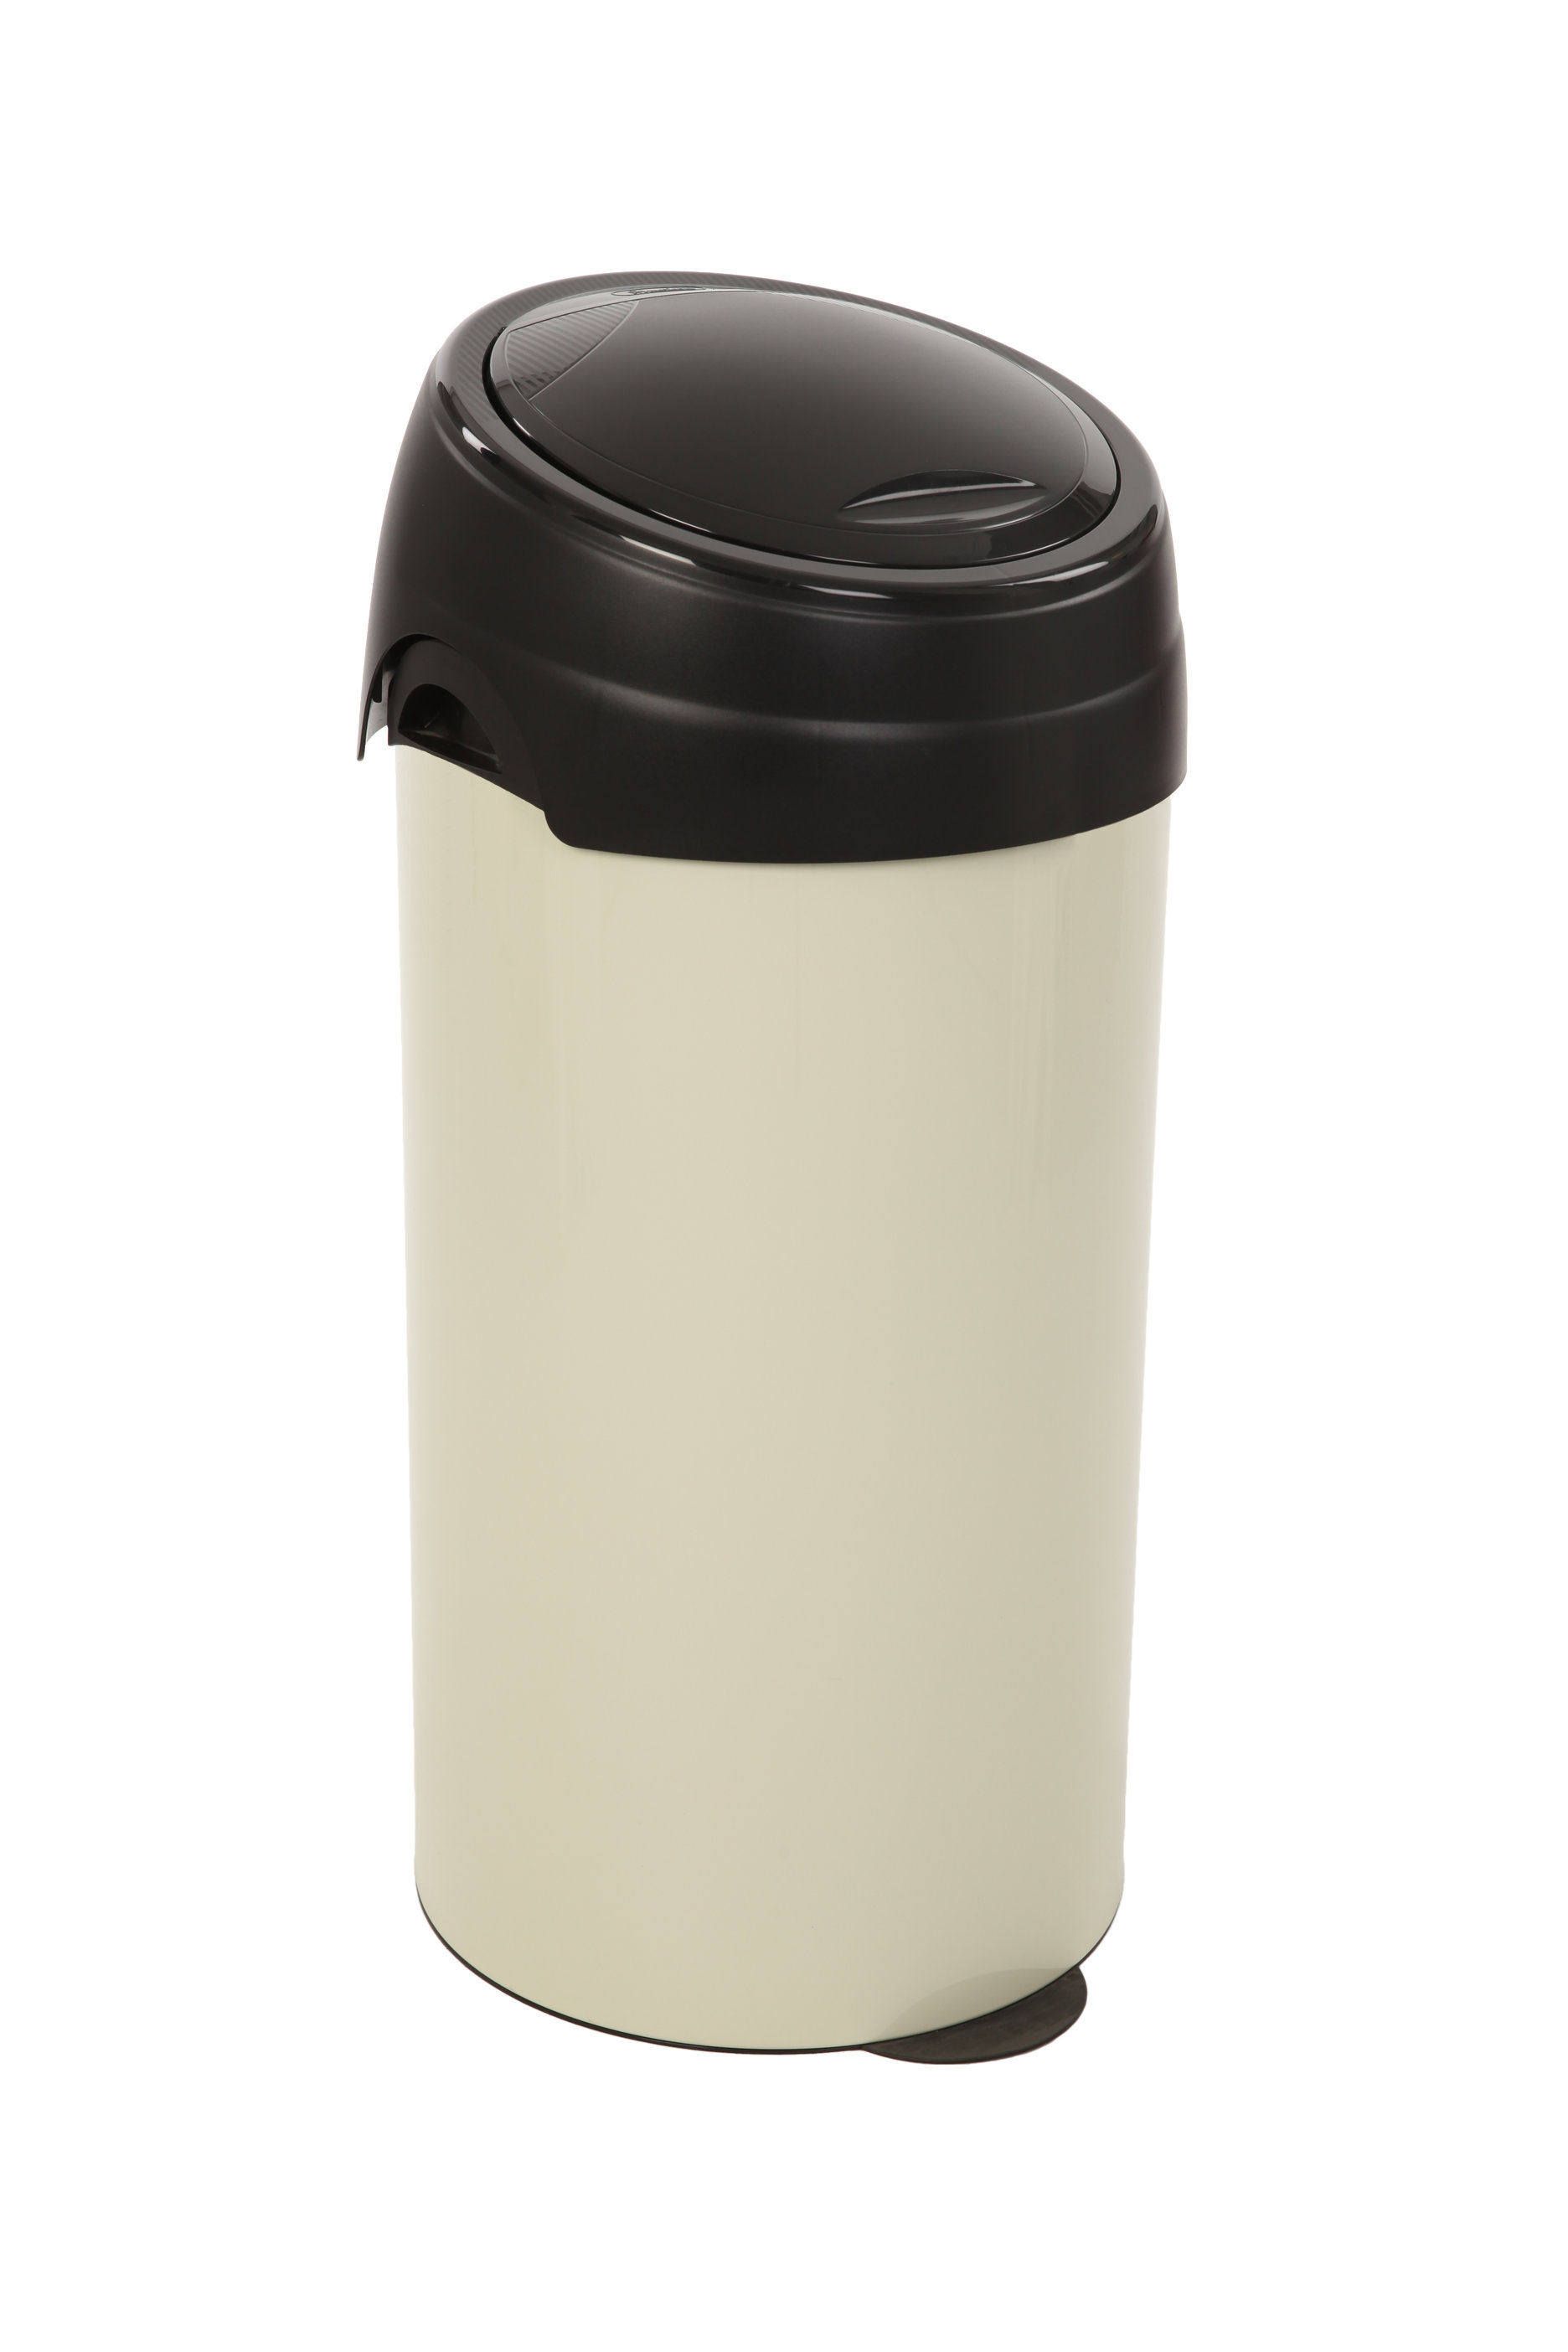 Ronde afvalbak met touchdeksel, 60 ltr (VB243703C)